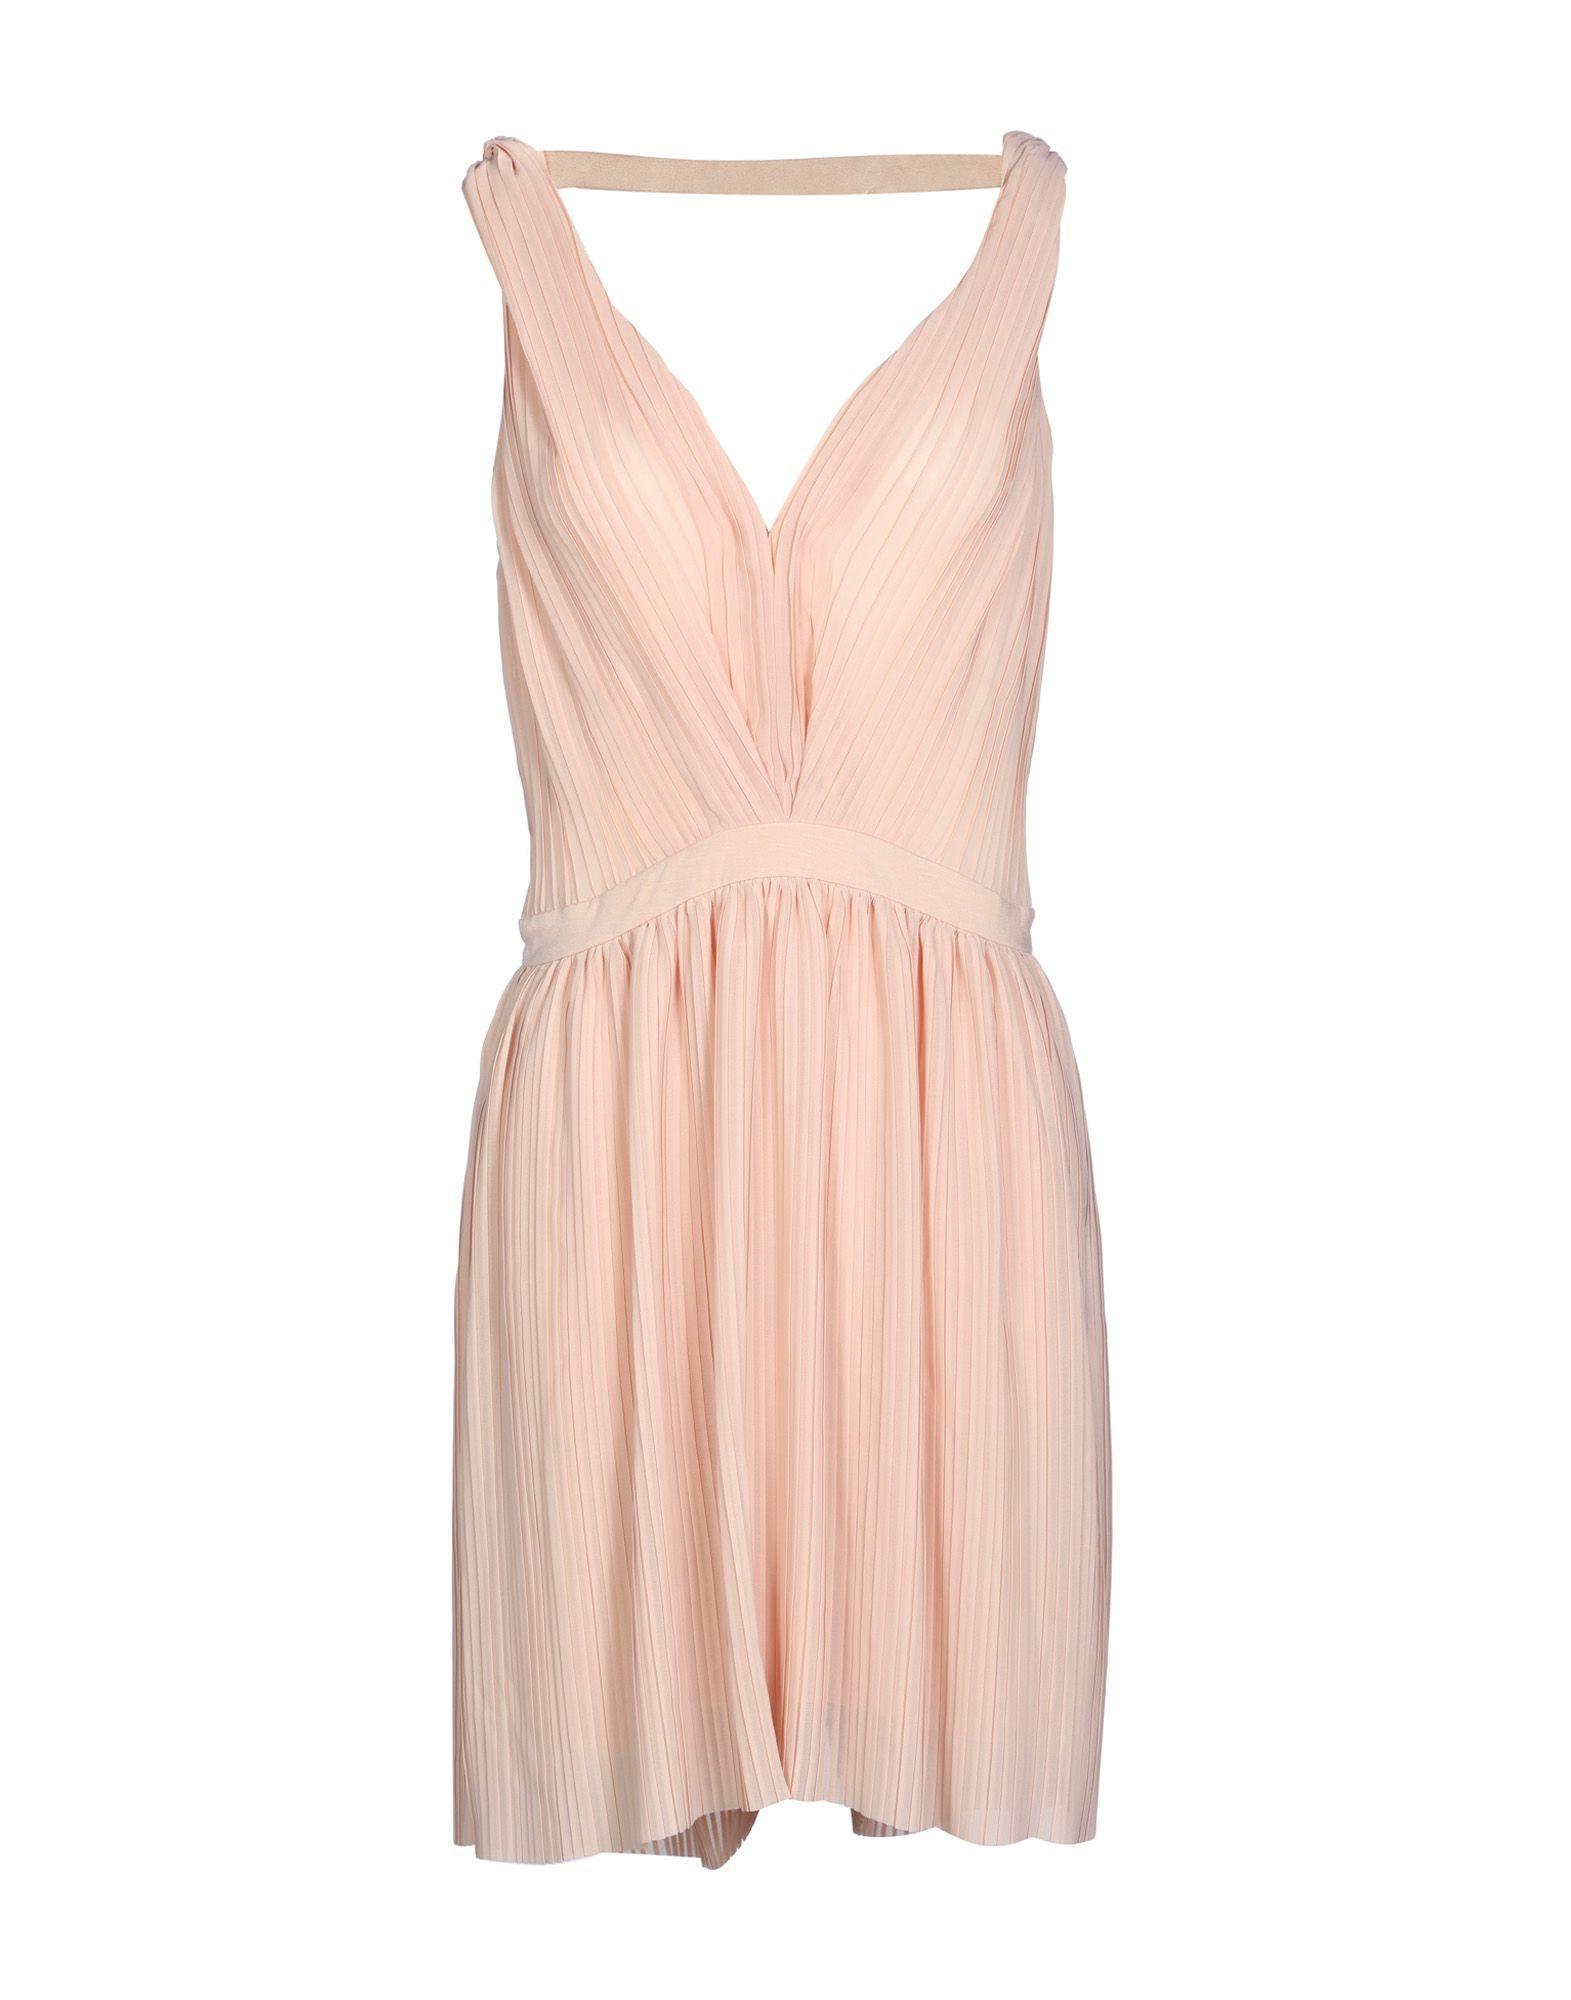 Maje Short Dress In Light Pink